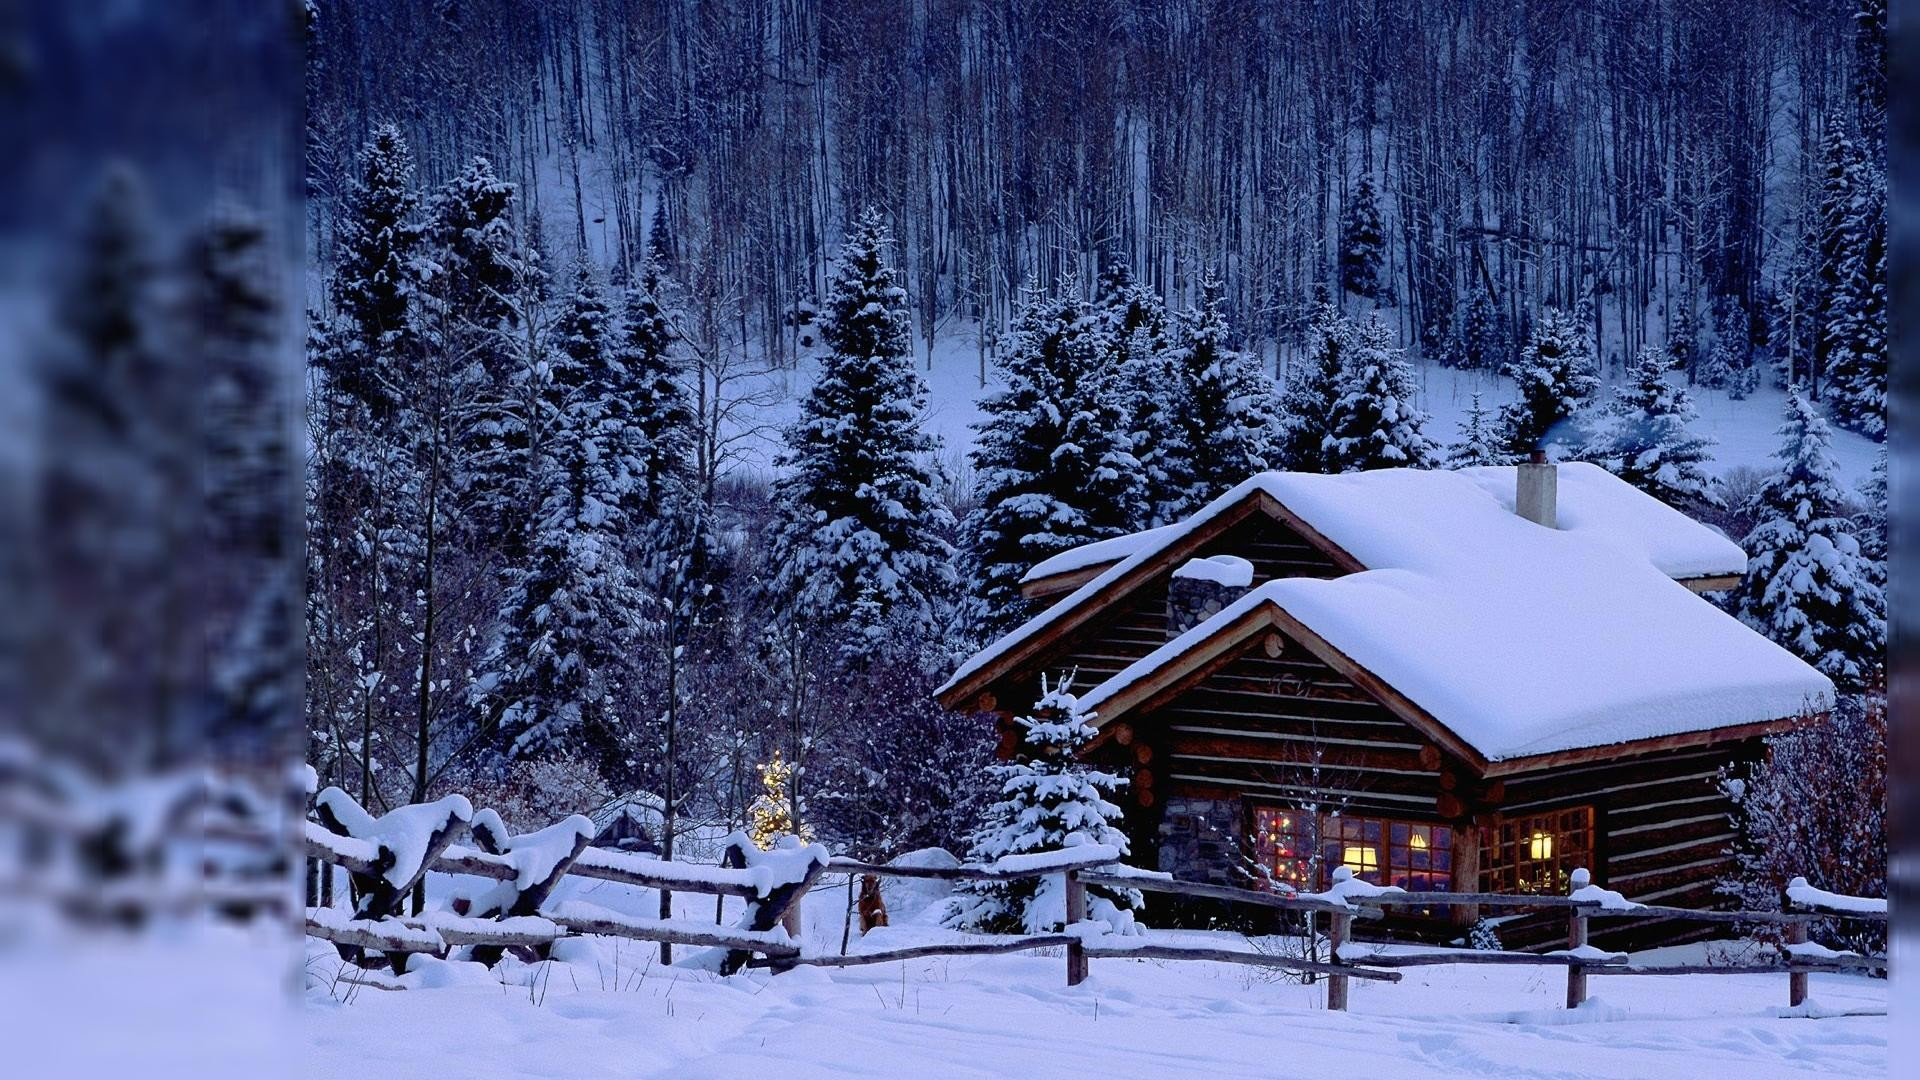 2. free-winter-desktop-wallpaper2-600×338